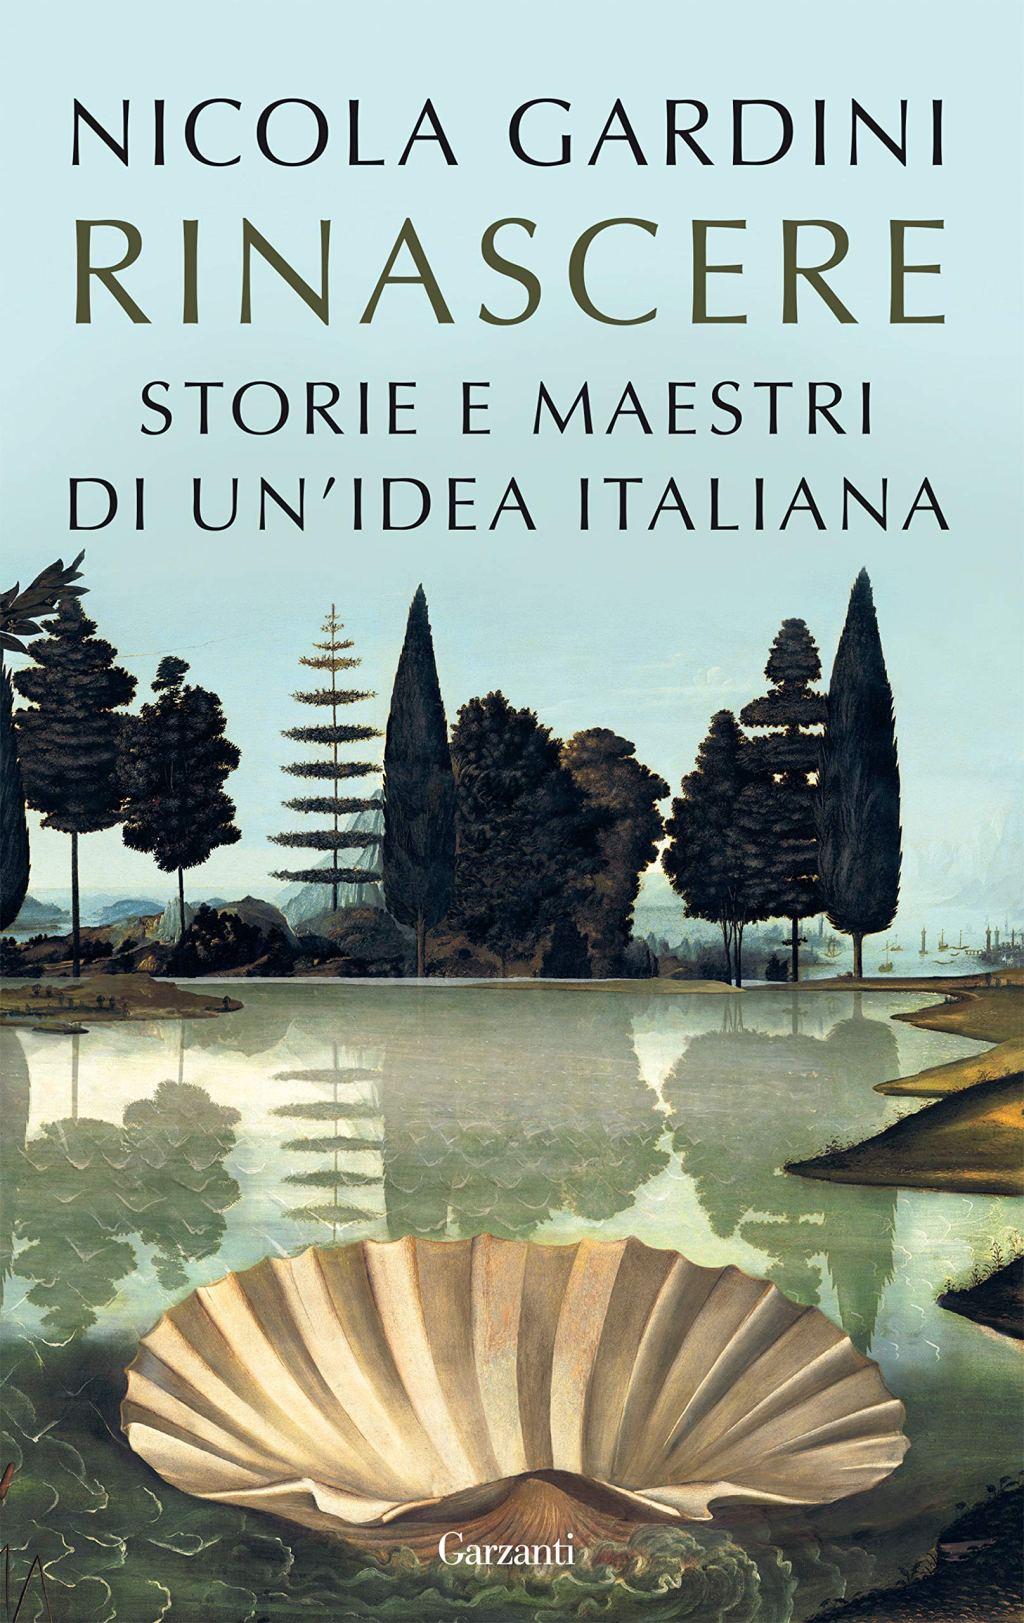 Nicola Gardini